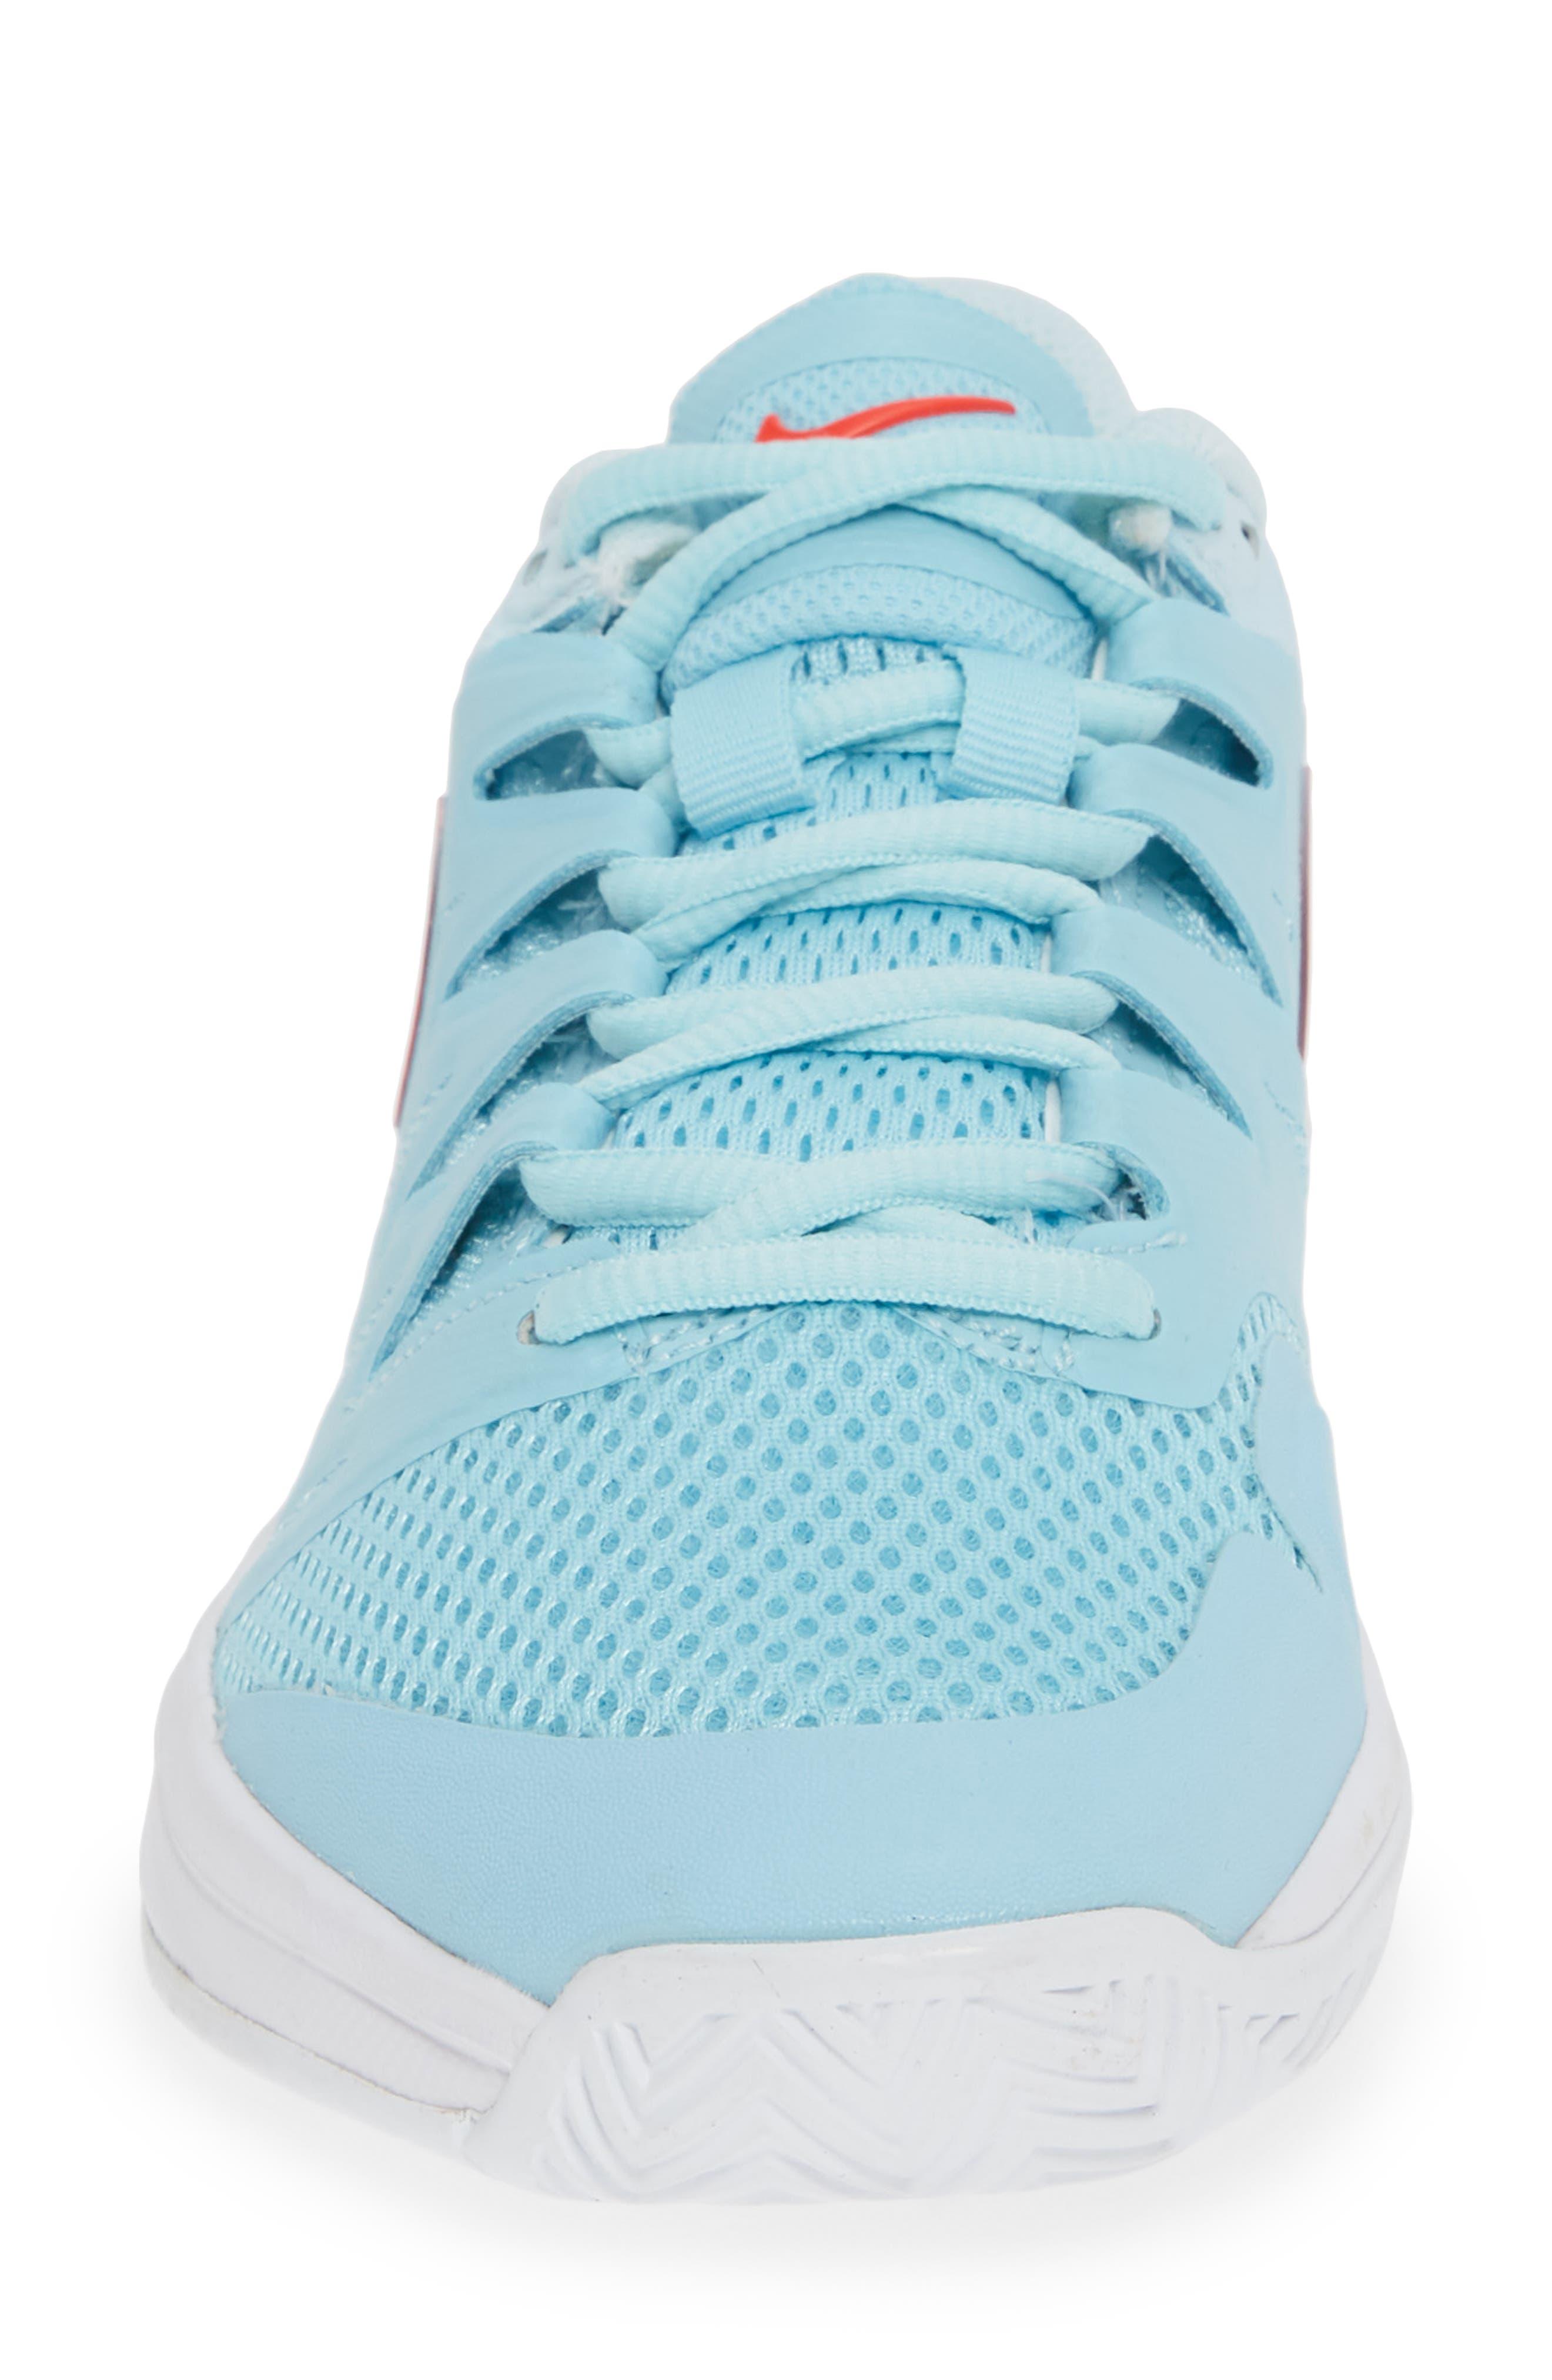 Air Zoom Prestige Tennis Shoe,                             Alternate thumbnail 4, color,                             BLUE/ BRIGHT CRIMSON-TOPAZ